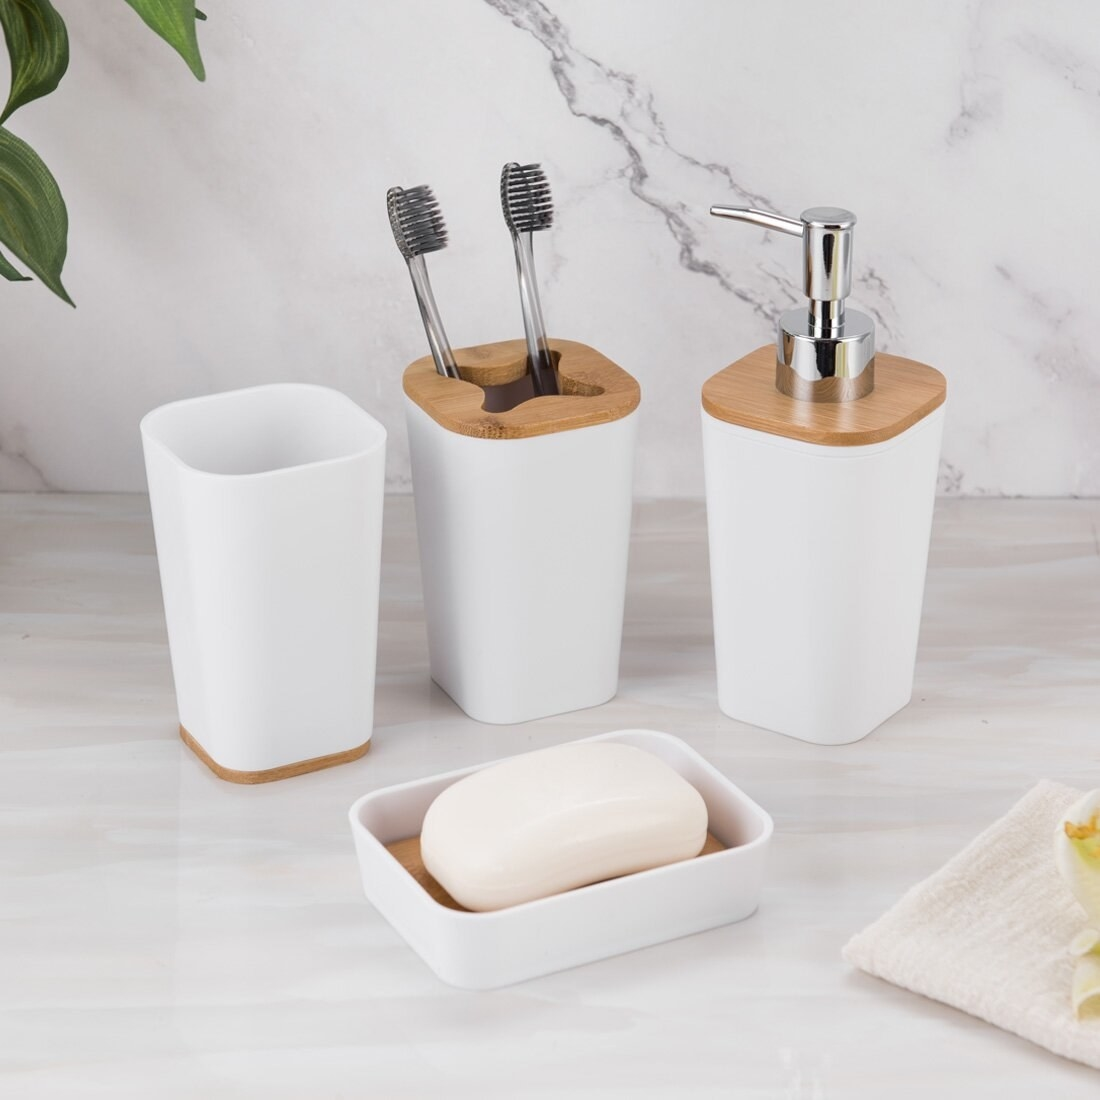 Bathroom accessory set on bathroom counter